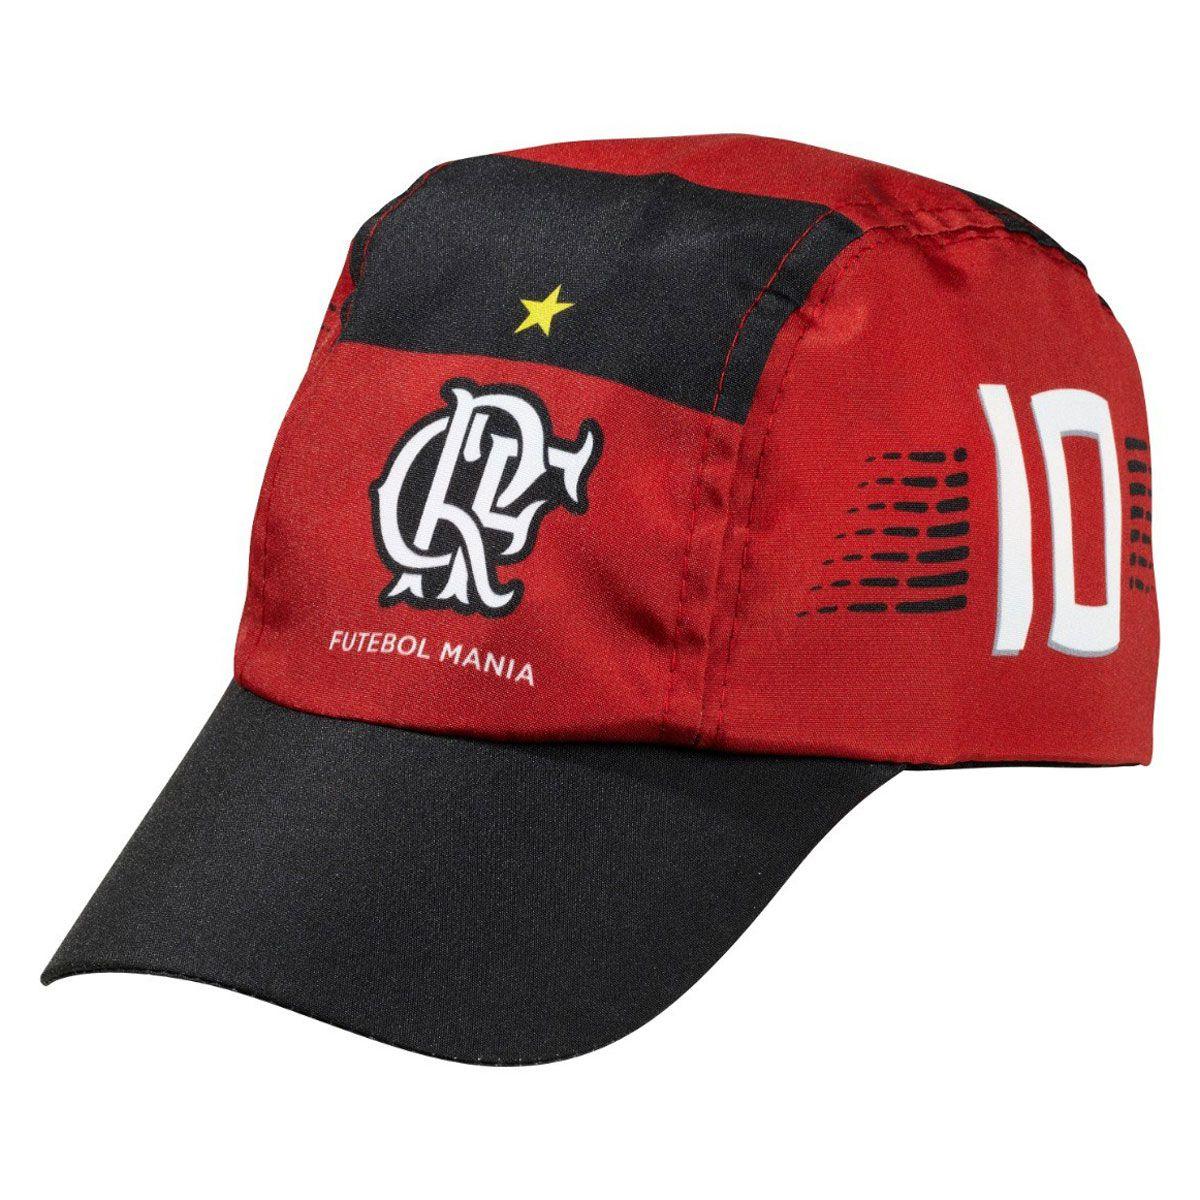 Boné Infantil do Flamengo - 265S